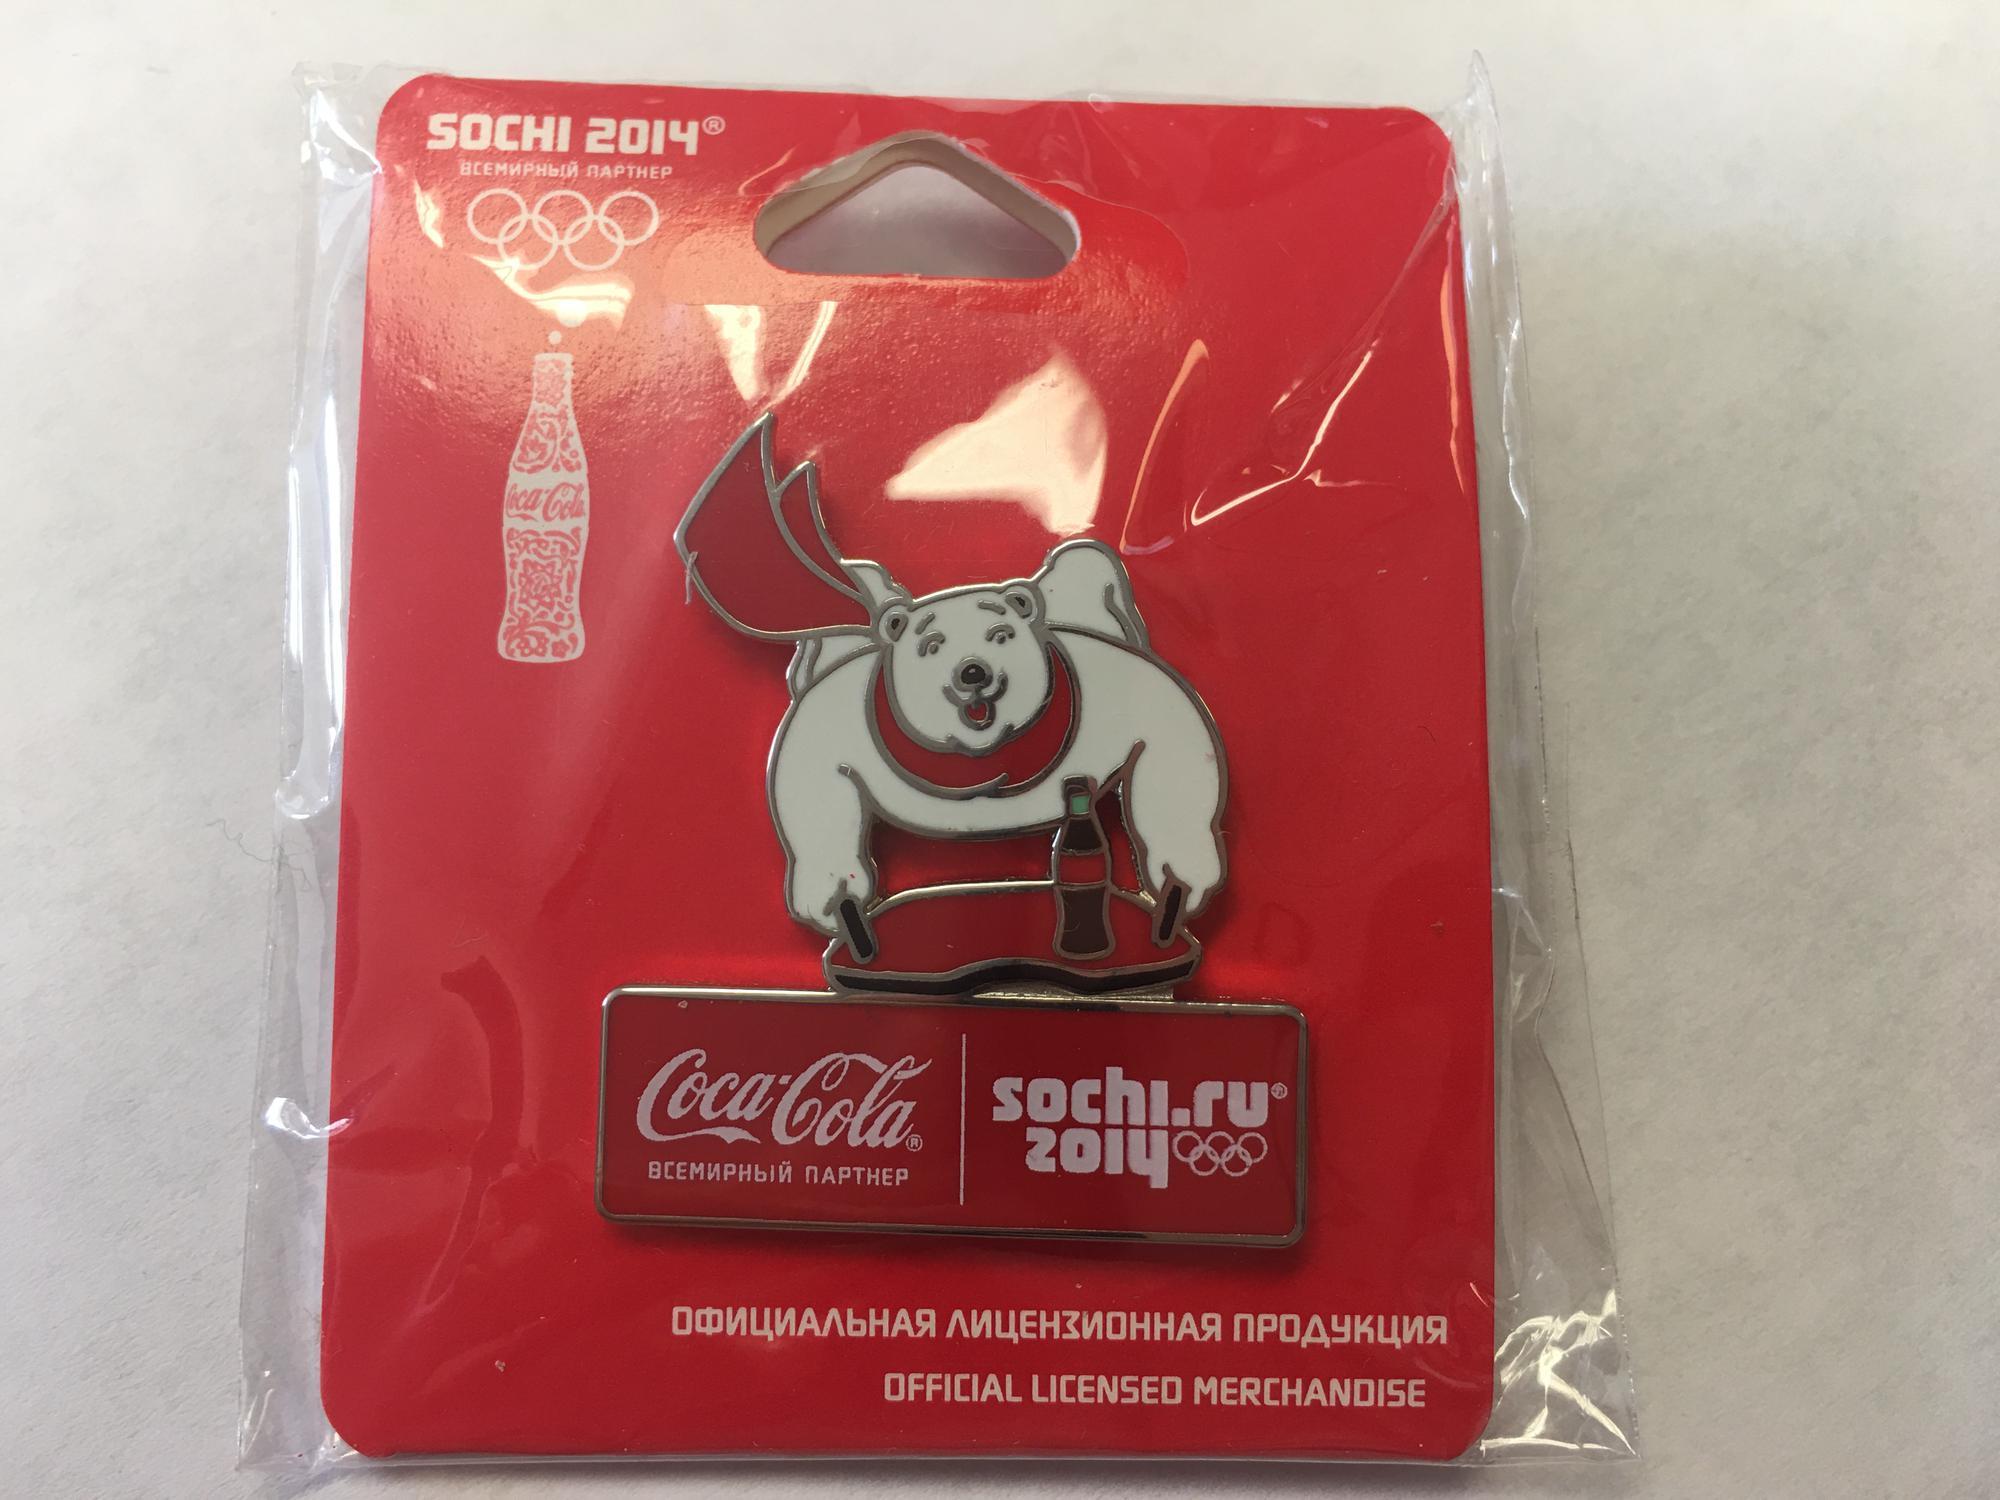 Coca Cola Polar Bear Sochi.ru 2014